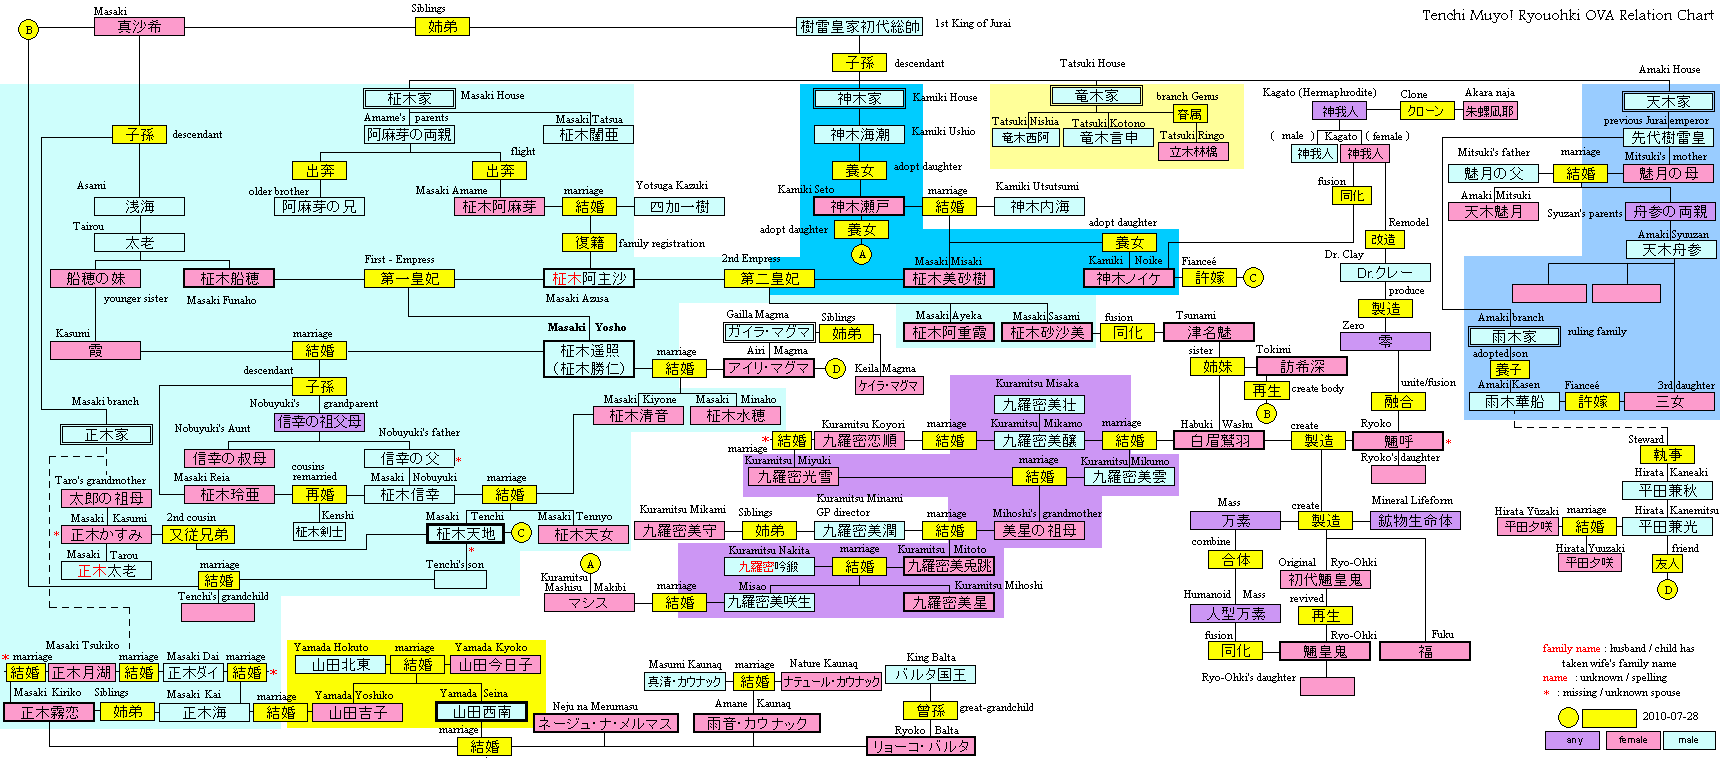 Tenchi ova family tree updated